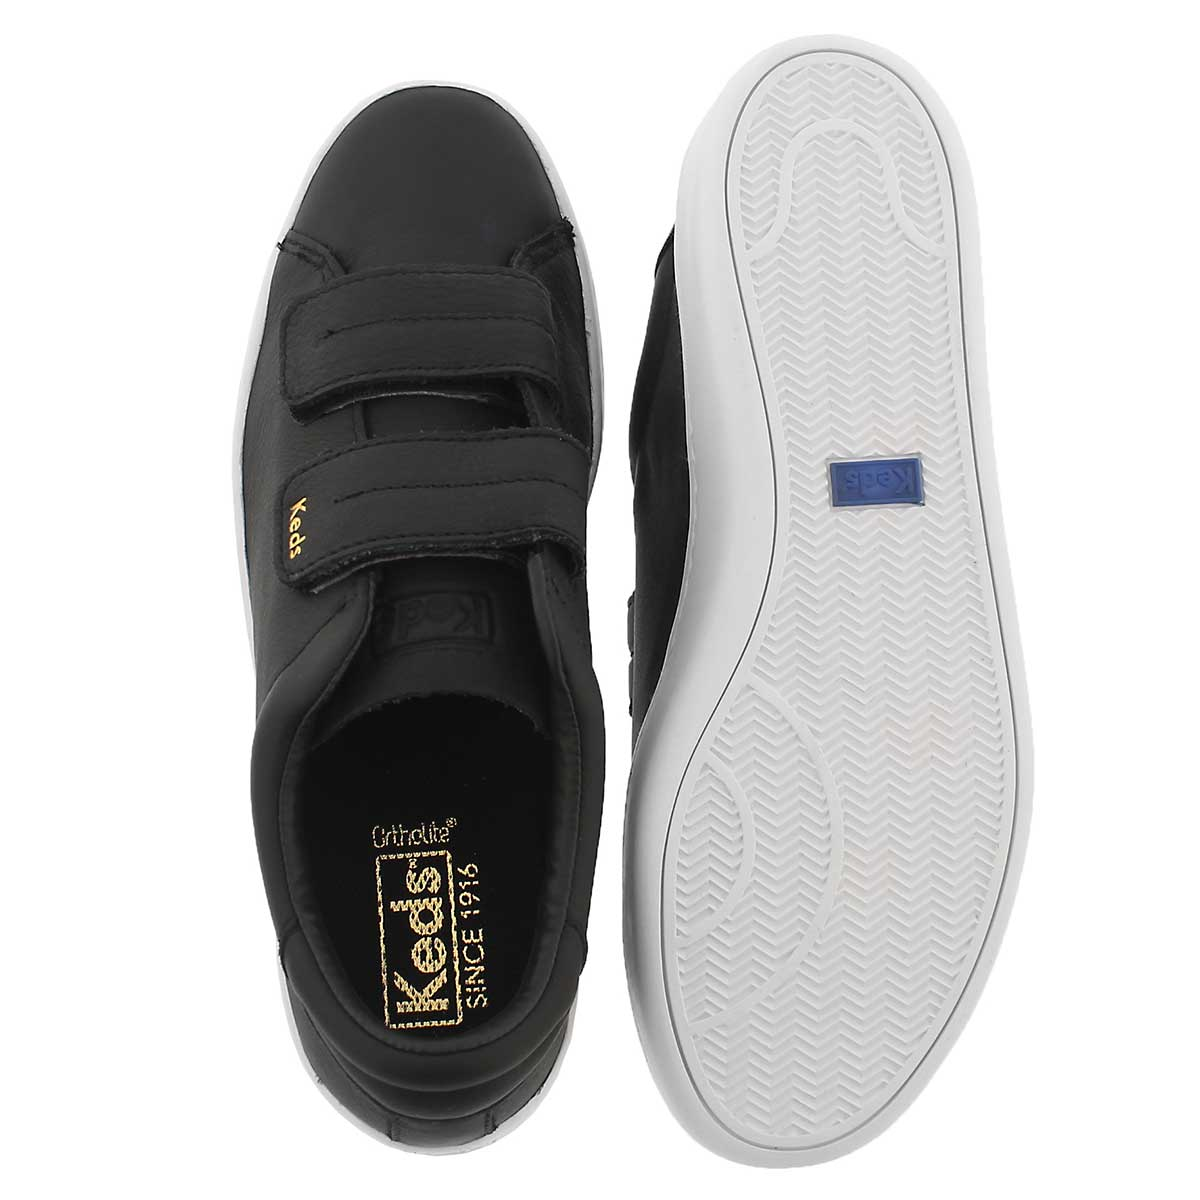 Lds Ace blk hook & loop lthr sneaker